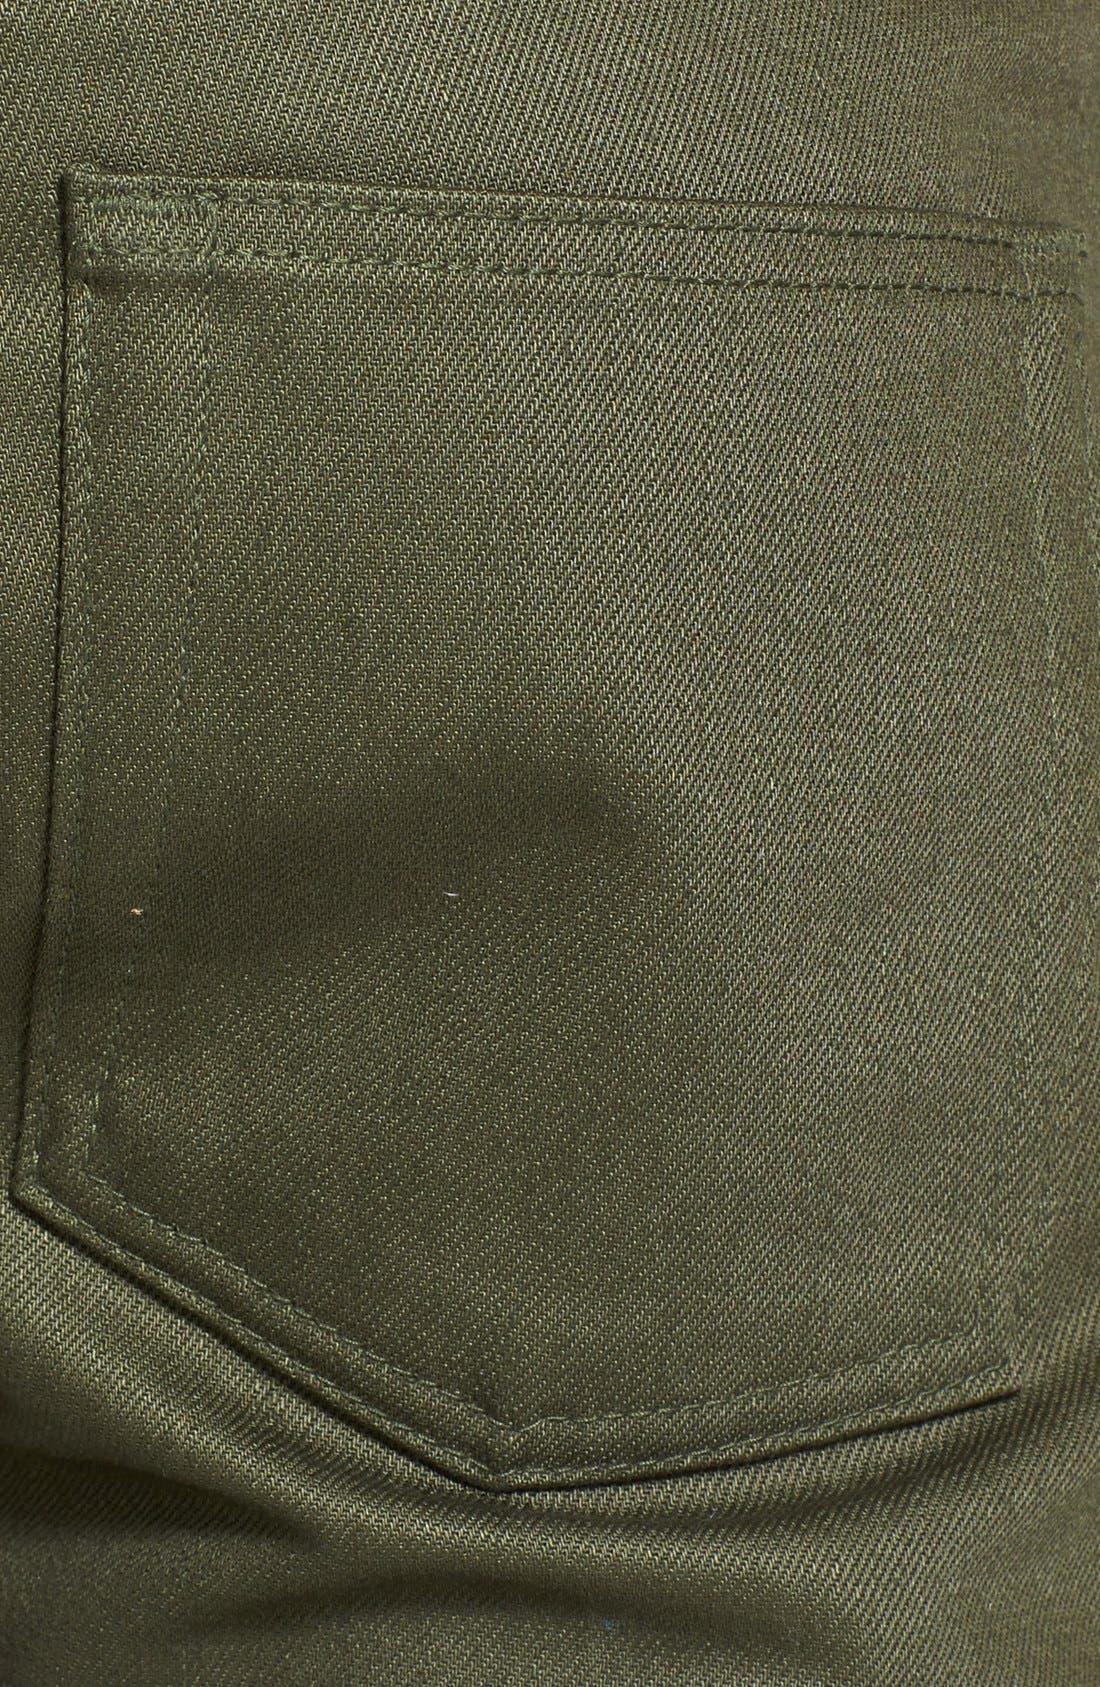 'Weird Guy' Slim Fit Jeans,                             Alternate thumbnail 4, color,                             Khaki Green Selvedge Chino